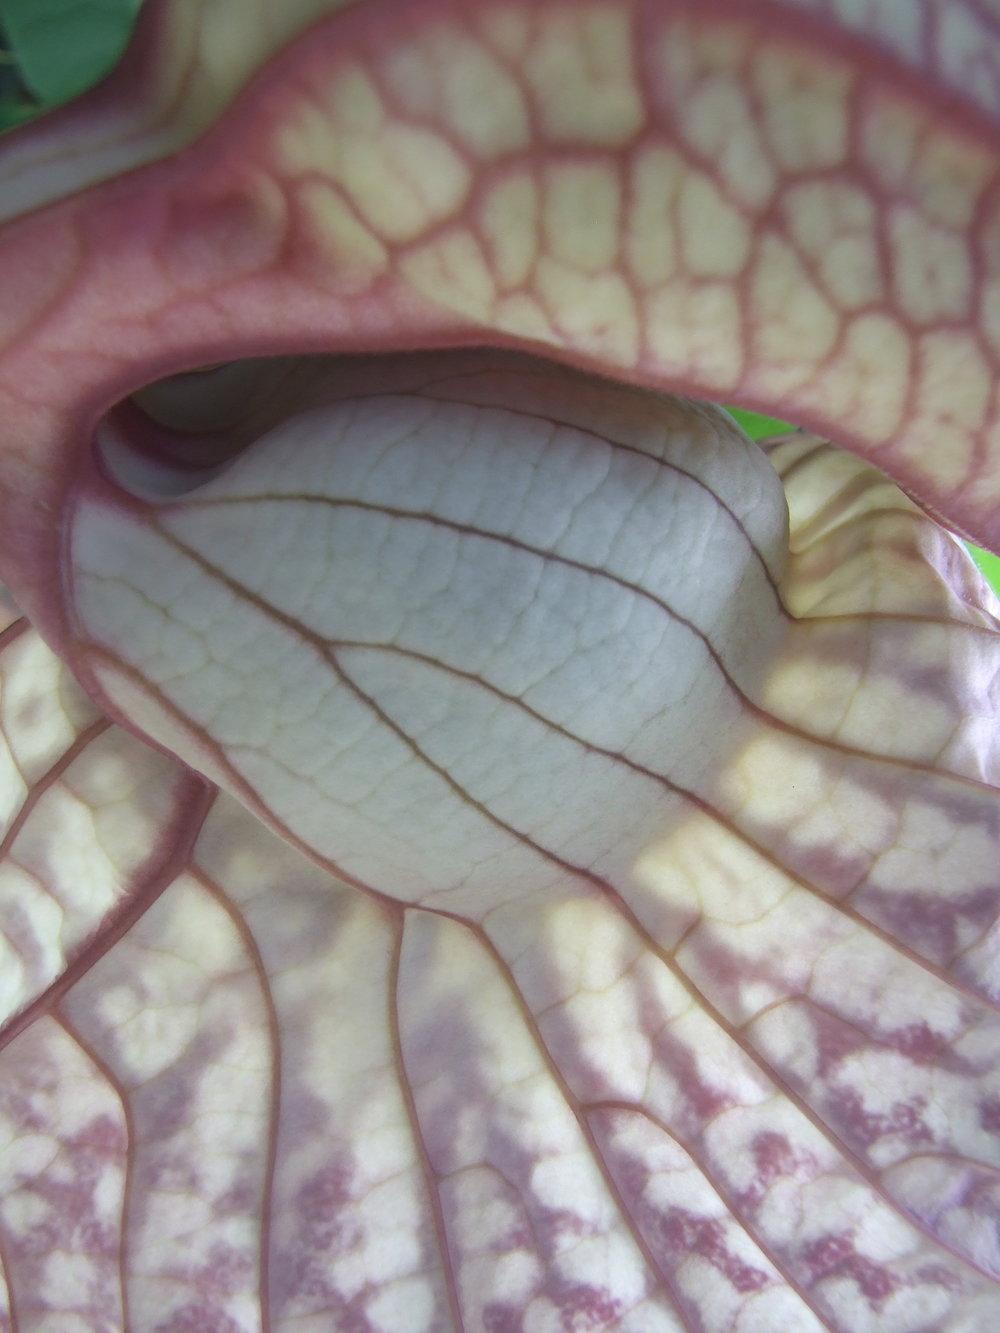 Aristolochia grandiflora detail.